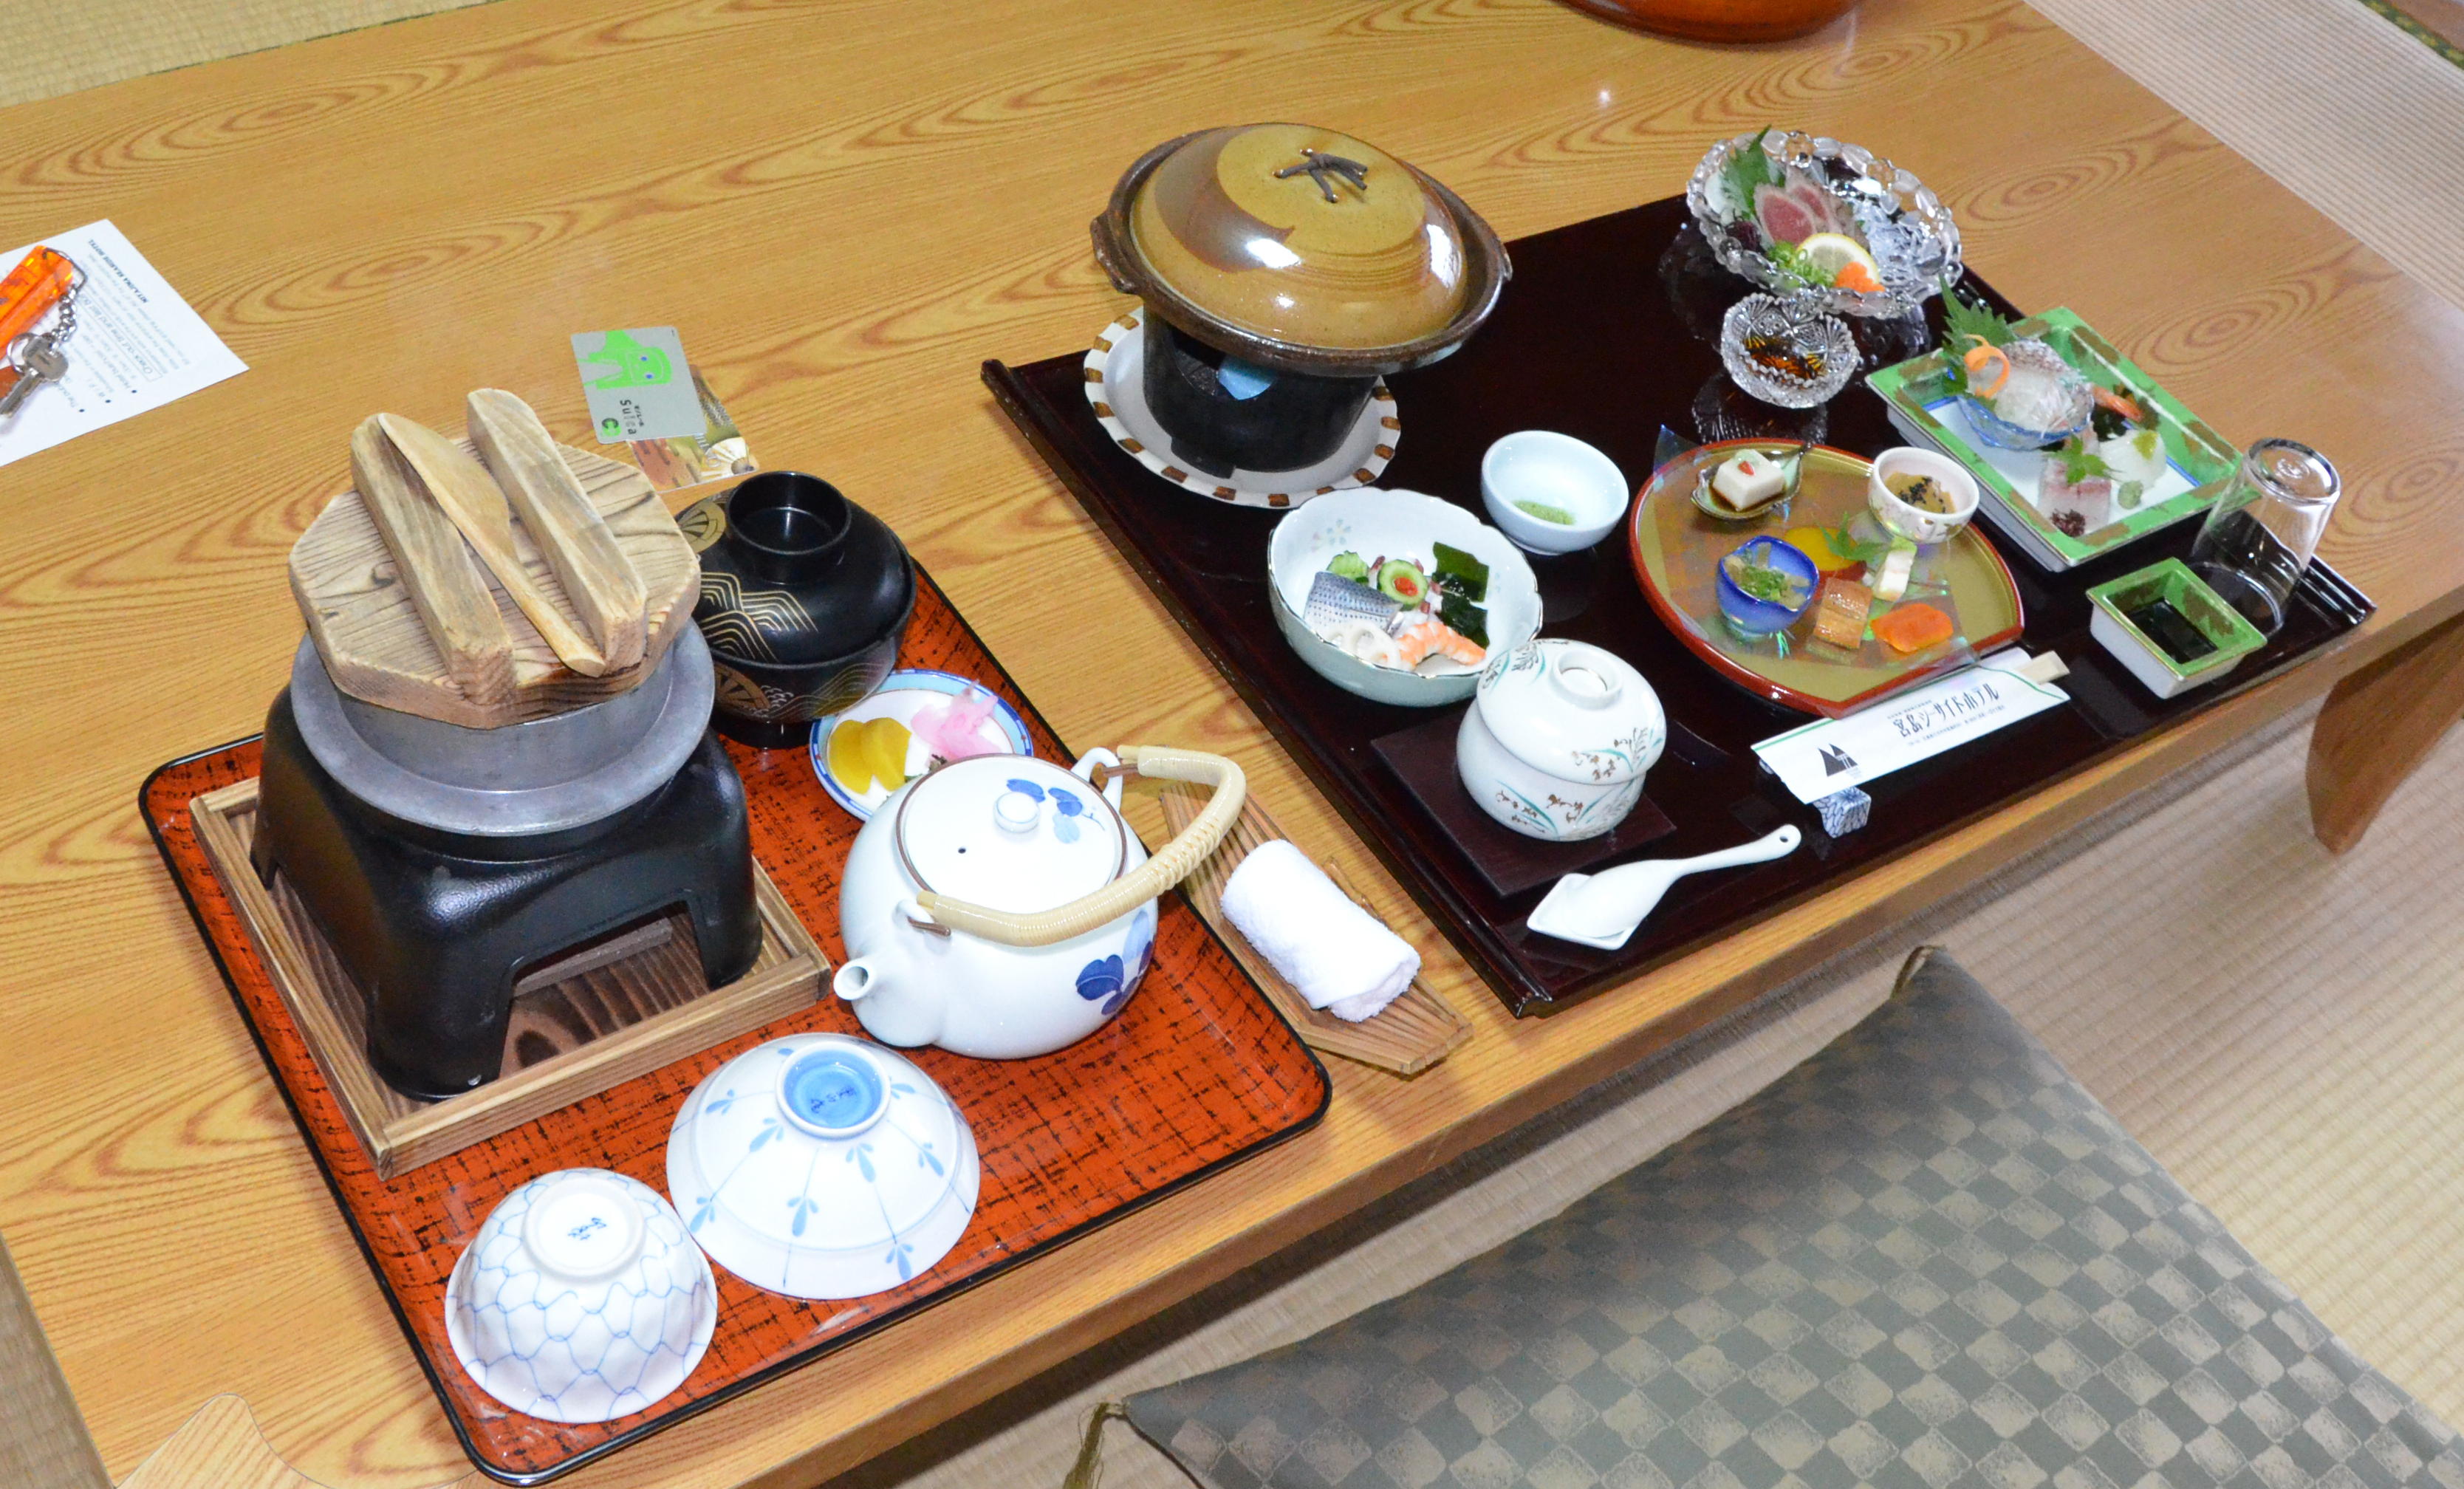 repas-kanseiki-ryokan-experience-incontournable-japon-maxitrips